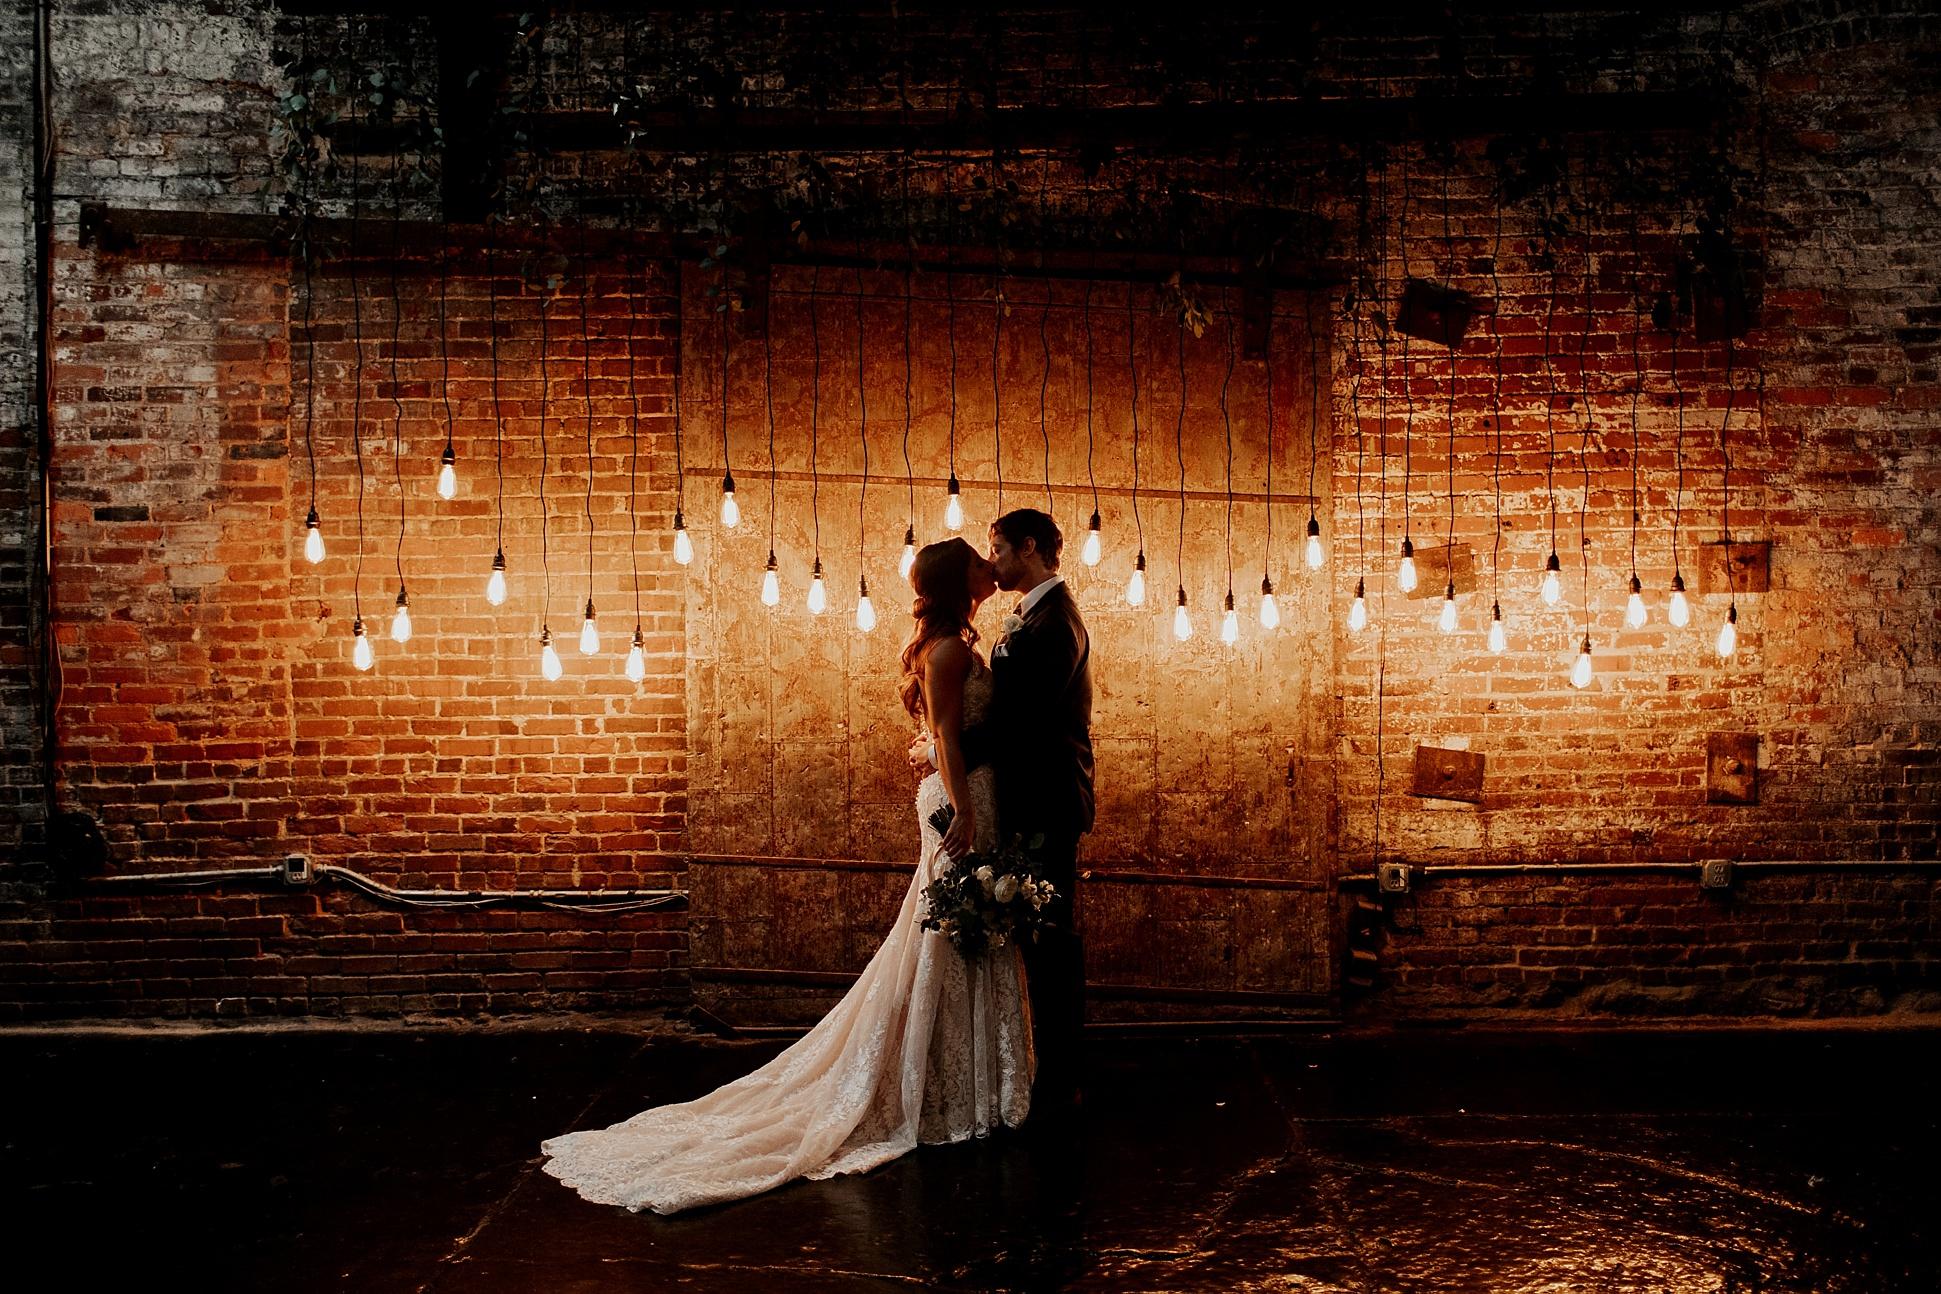 king_plow_wedding_atlanta001.JPG